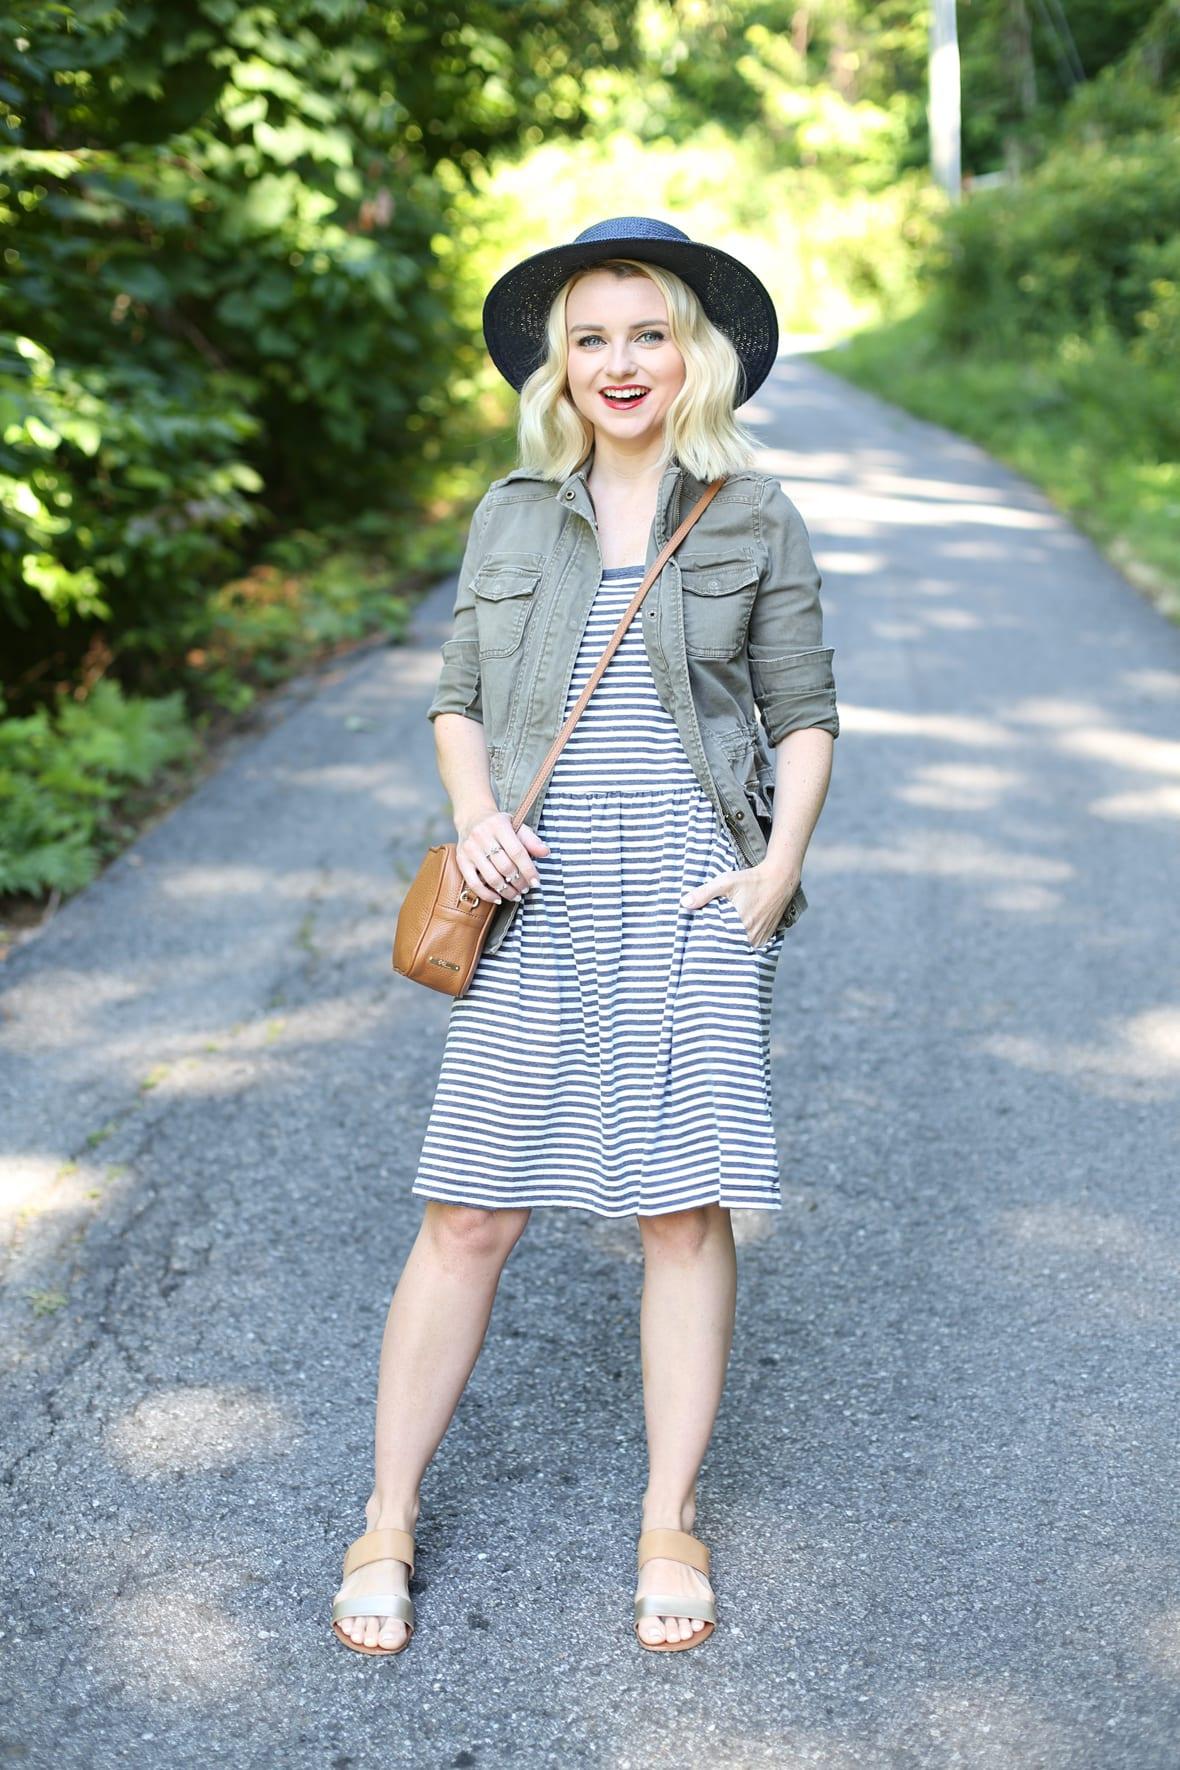 Striped Cami Dress and Cargo Jacket in North Carolina - Poor Little It Girl - @poorlilitgirl